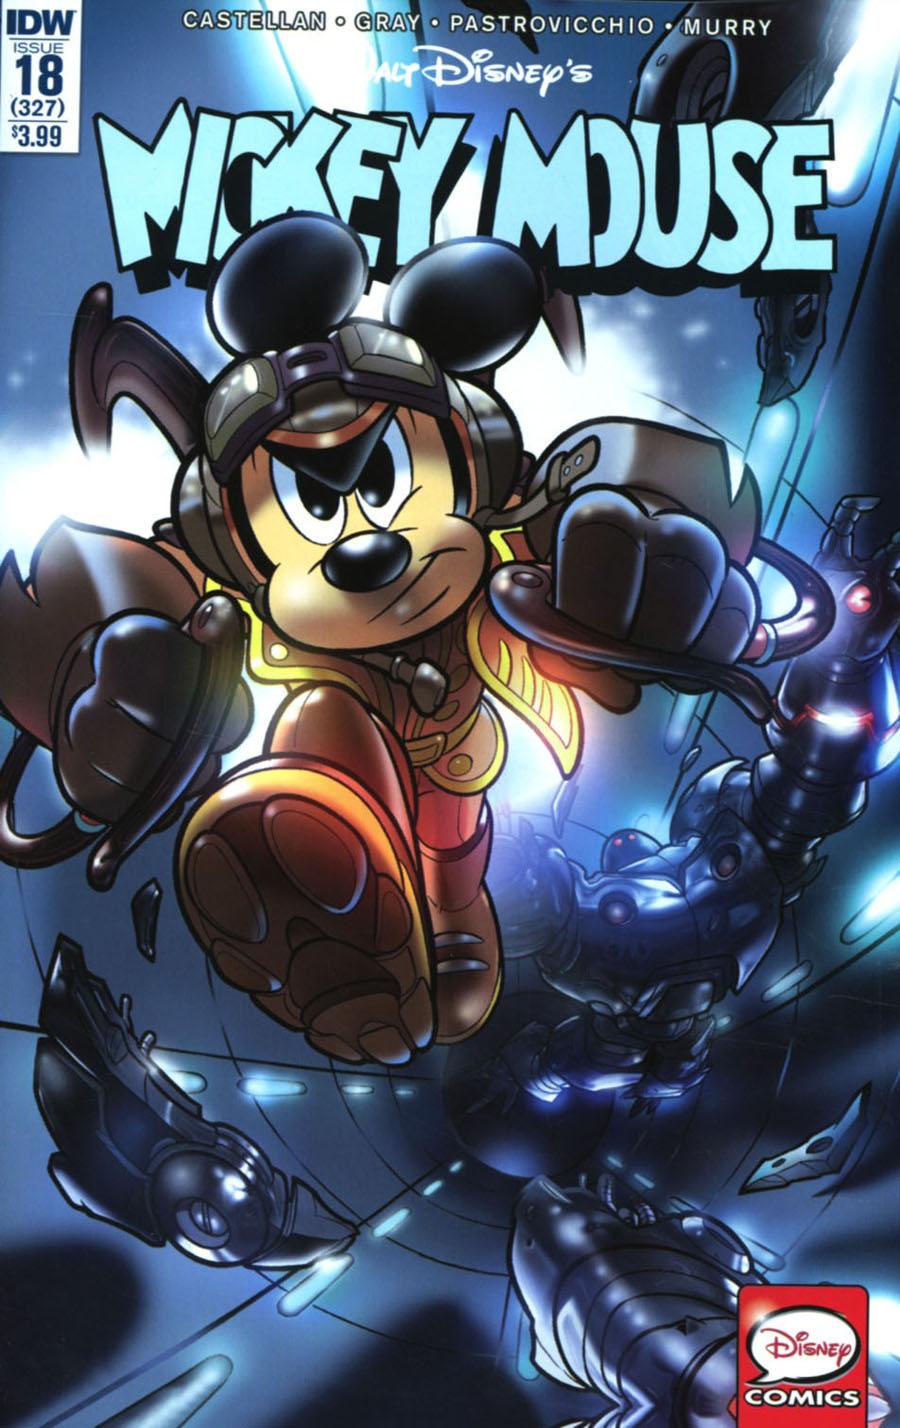 Mickey Mouse Vol 2 #18 Cover A Regular Lorenzo Pastrovicchio Cover